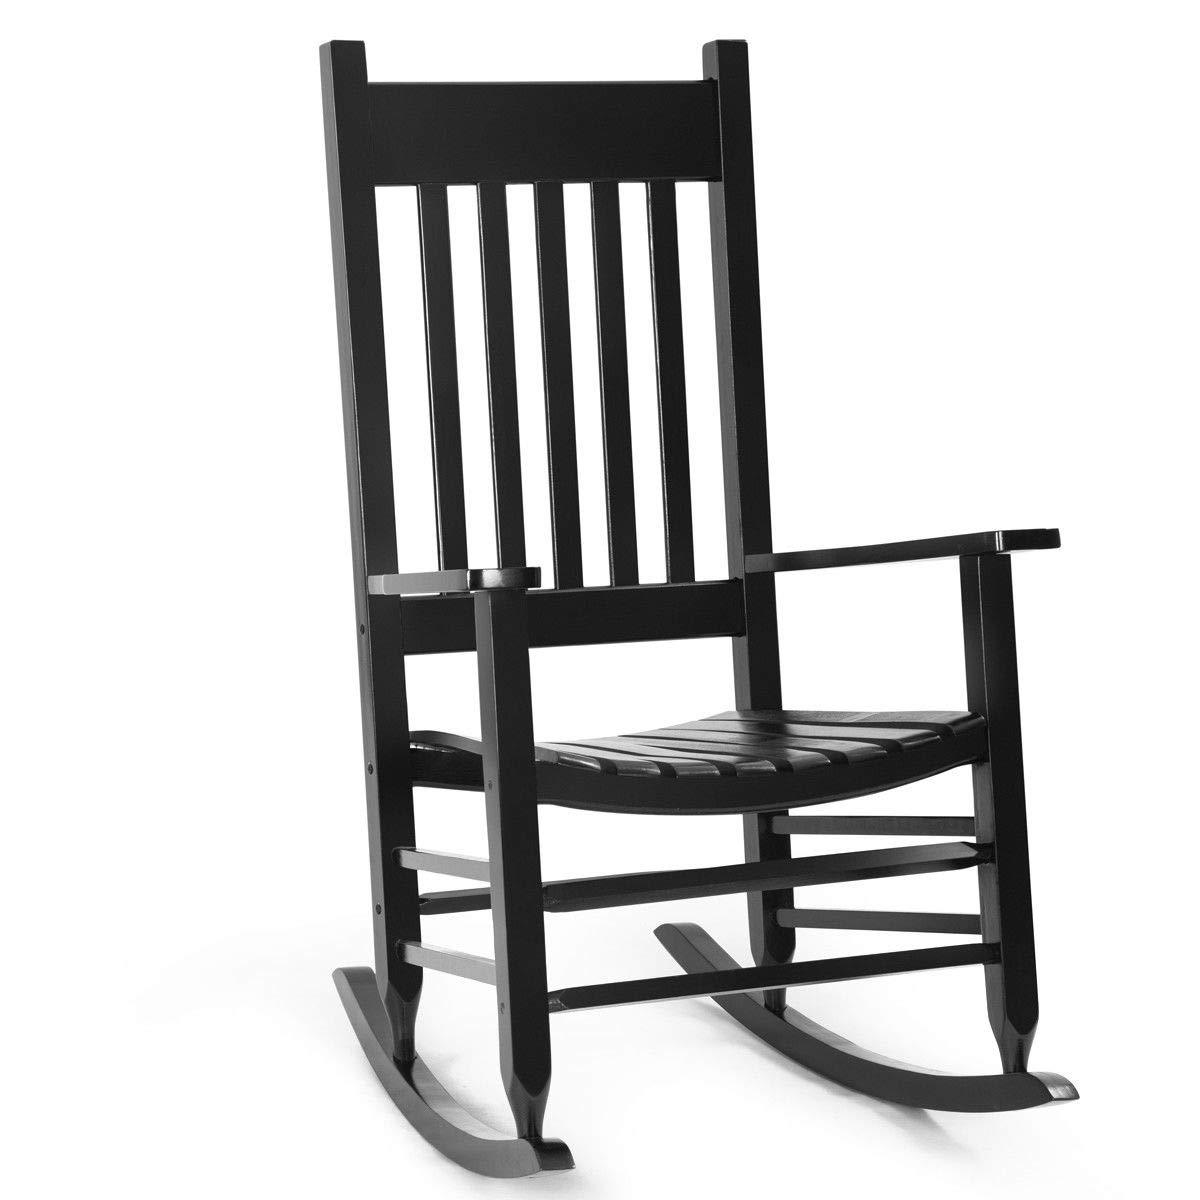 Giantex Solid Wood Rocking Chair Porch Rocker Indoor Outdoor Deck Patio Backyard Rocking Chairs (Black) by Giantex